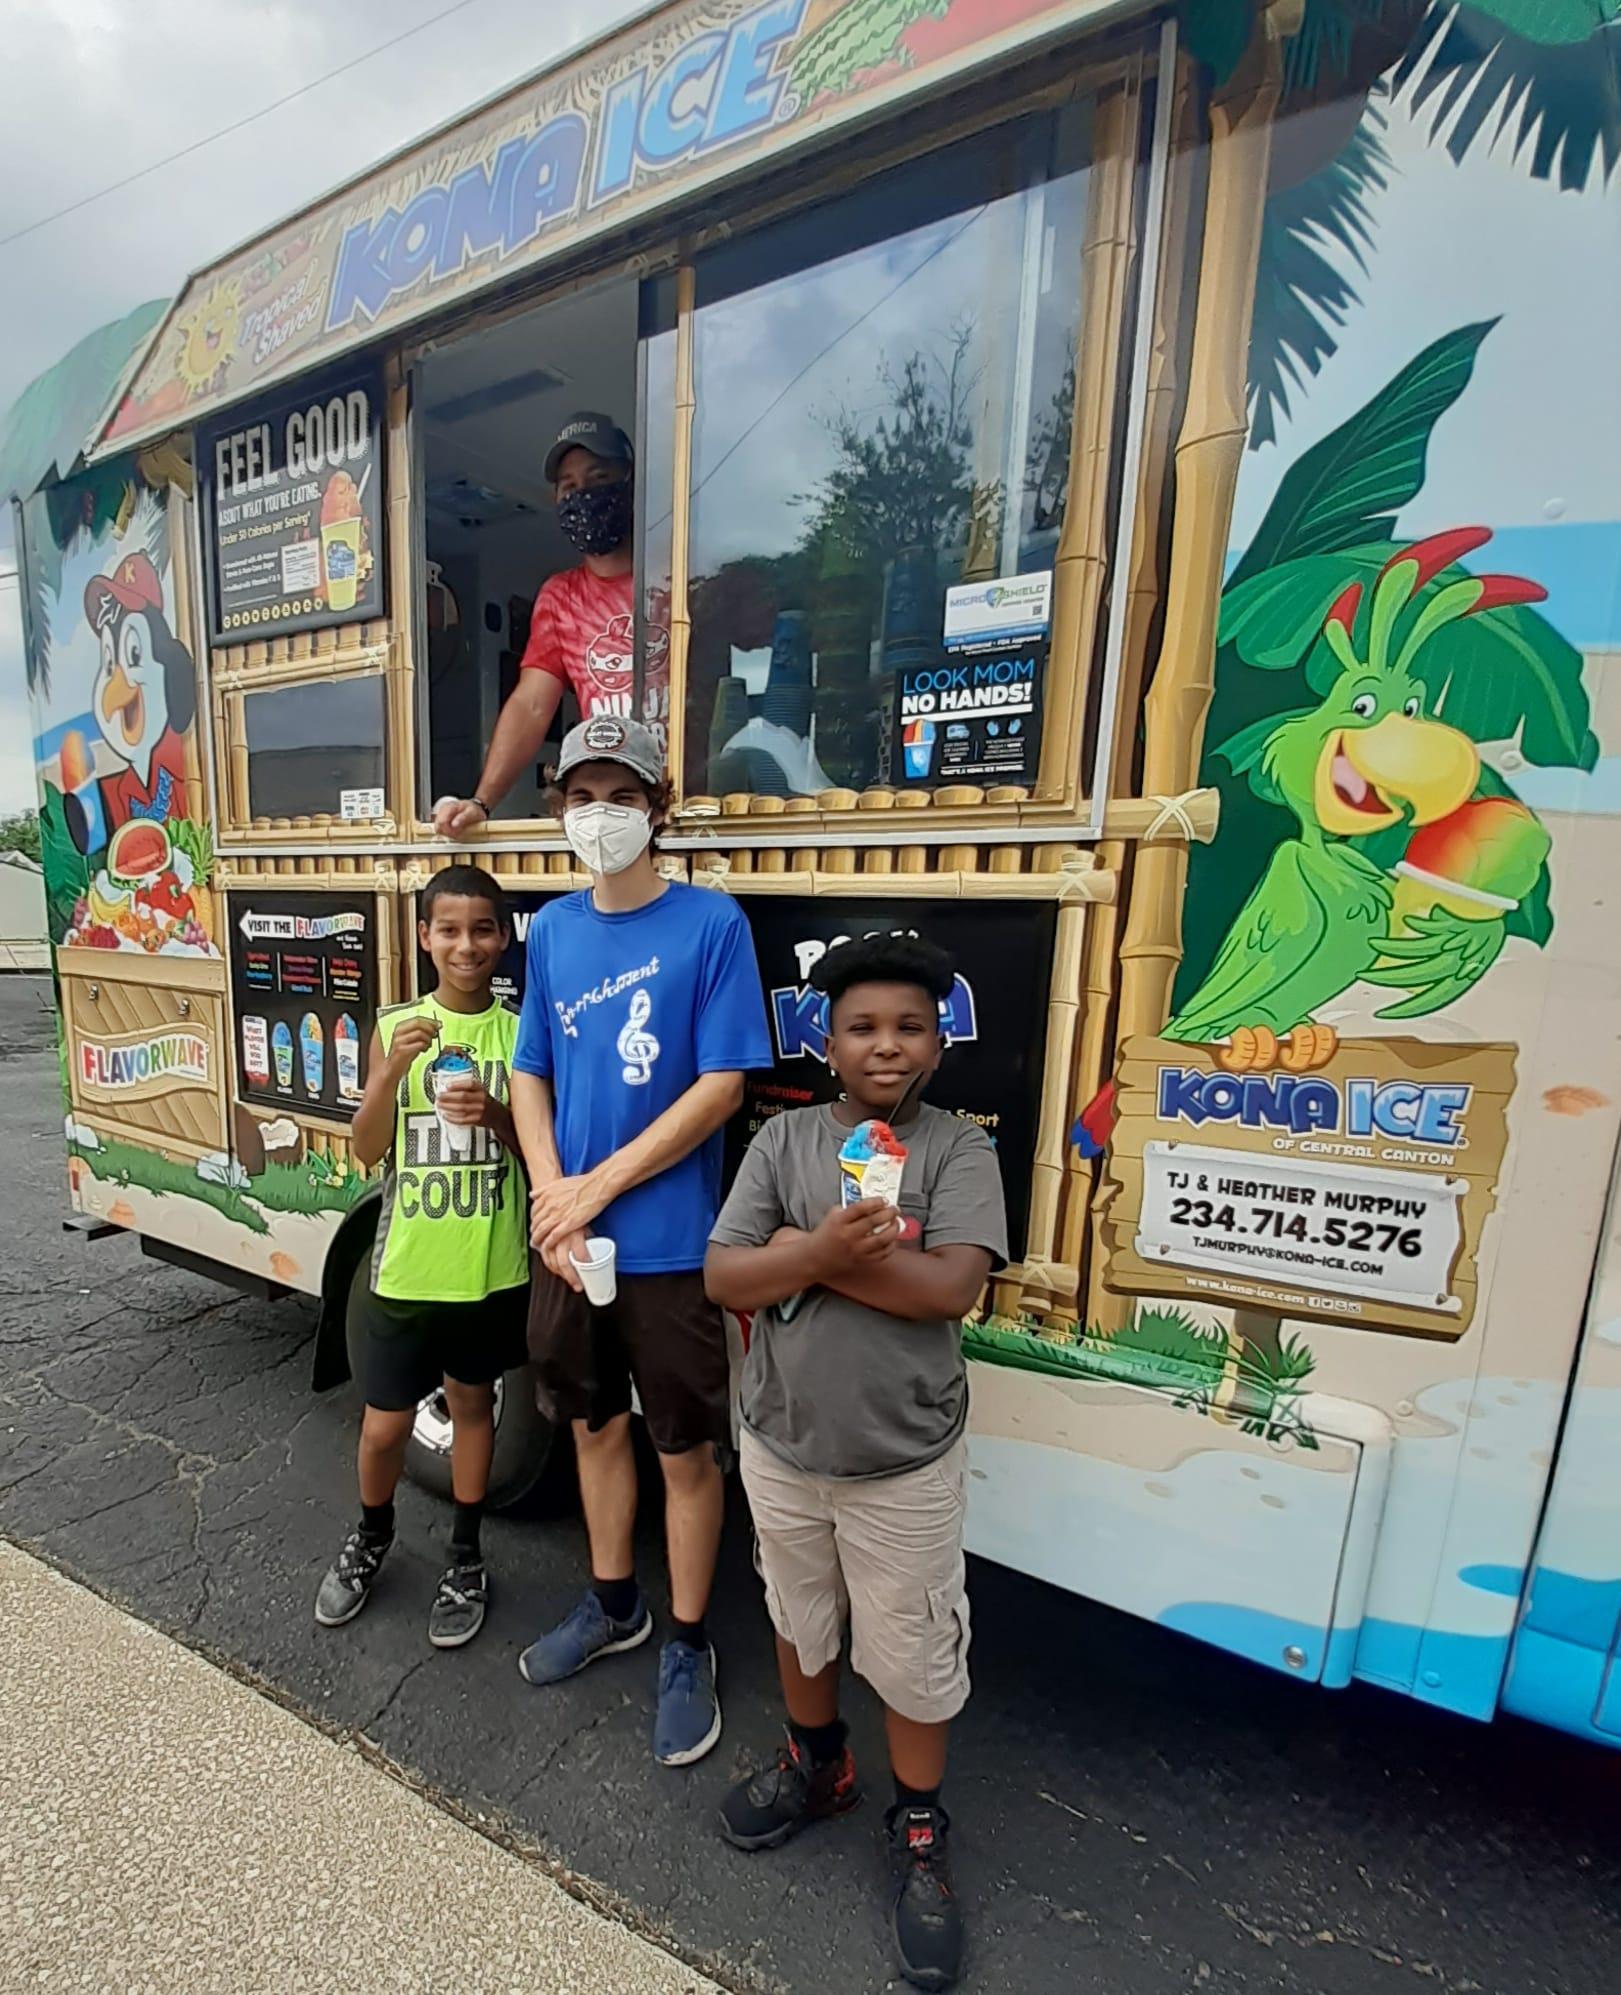 Kona ice Truck Fine Arts Summer Camp